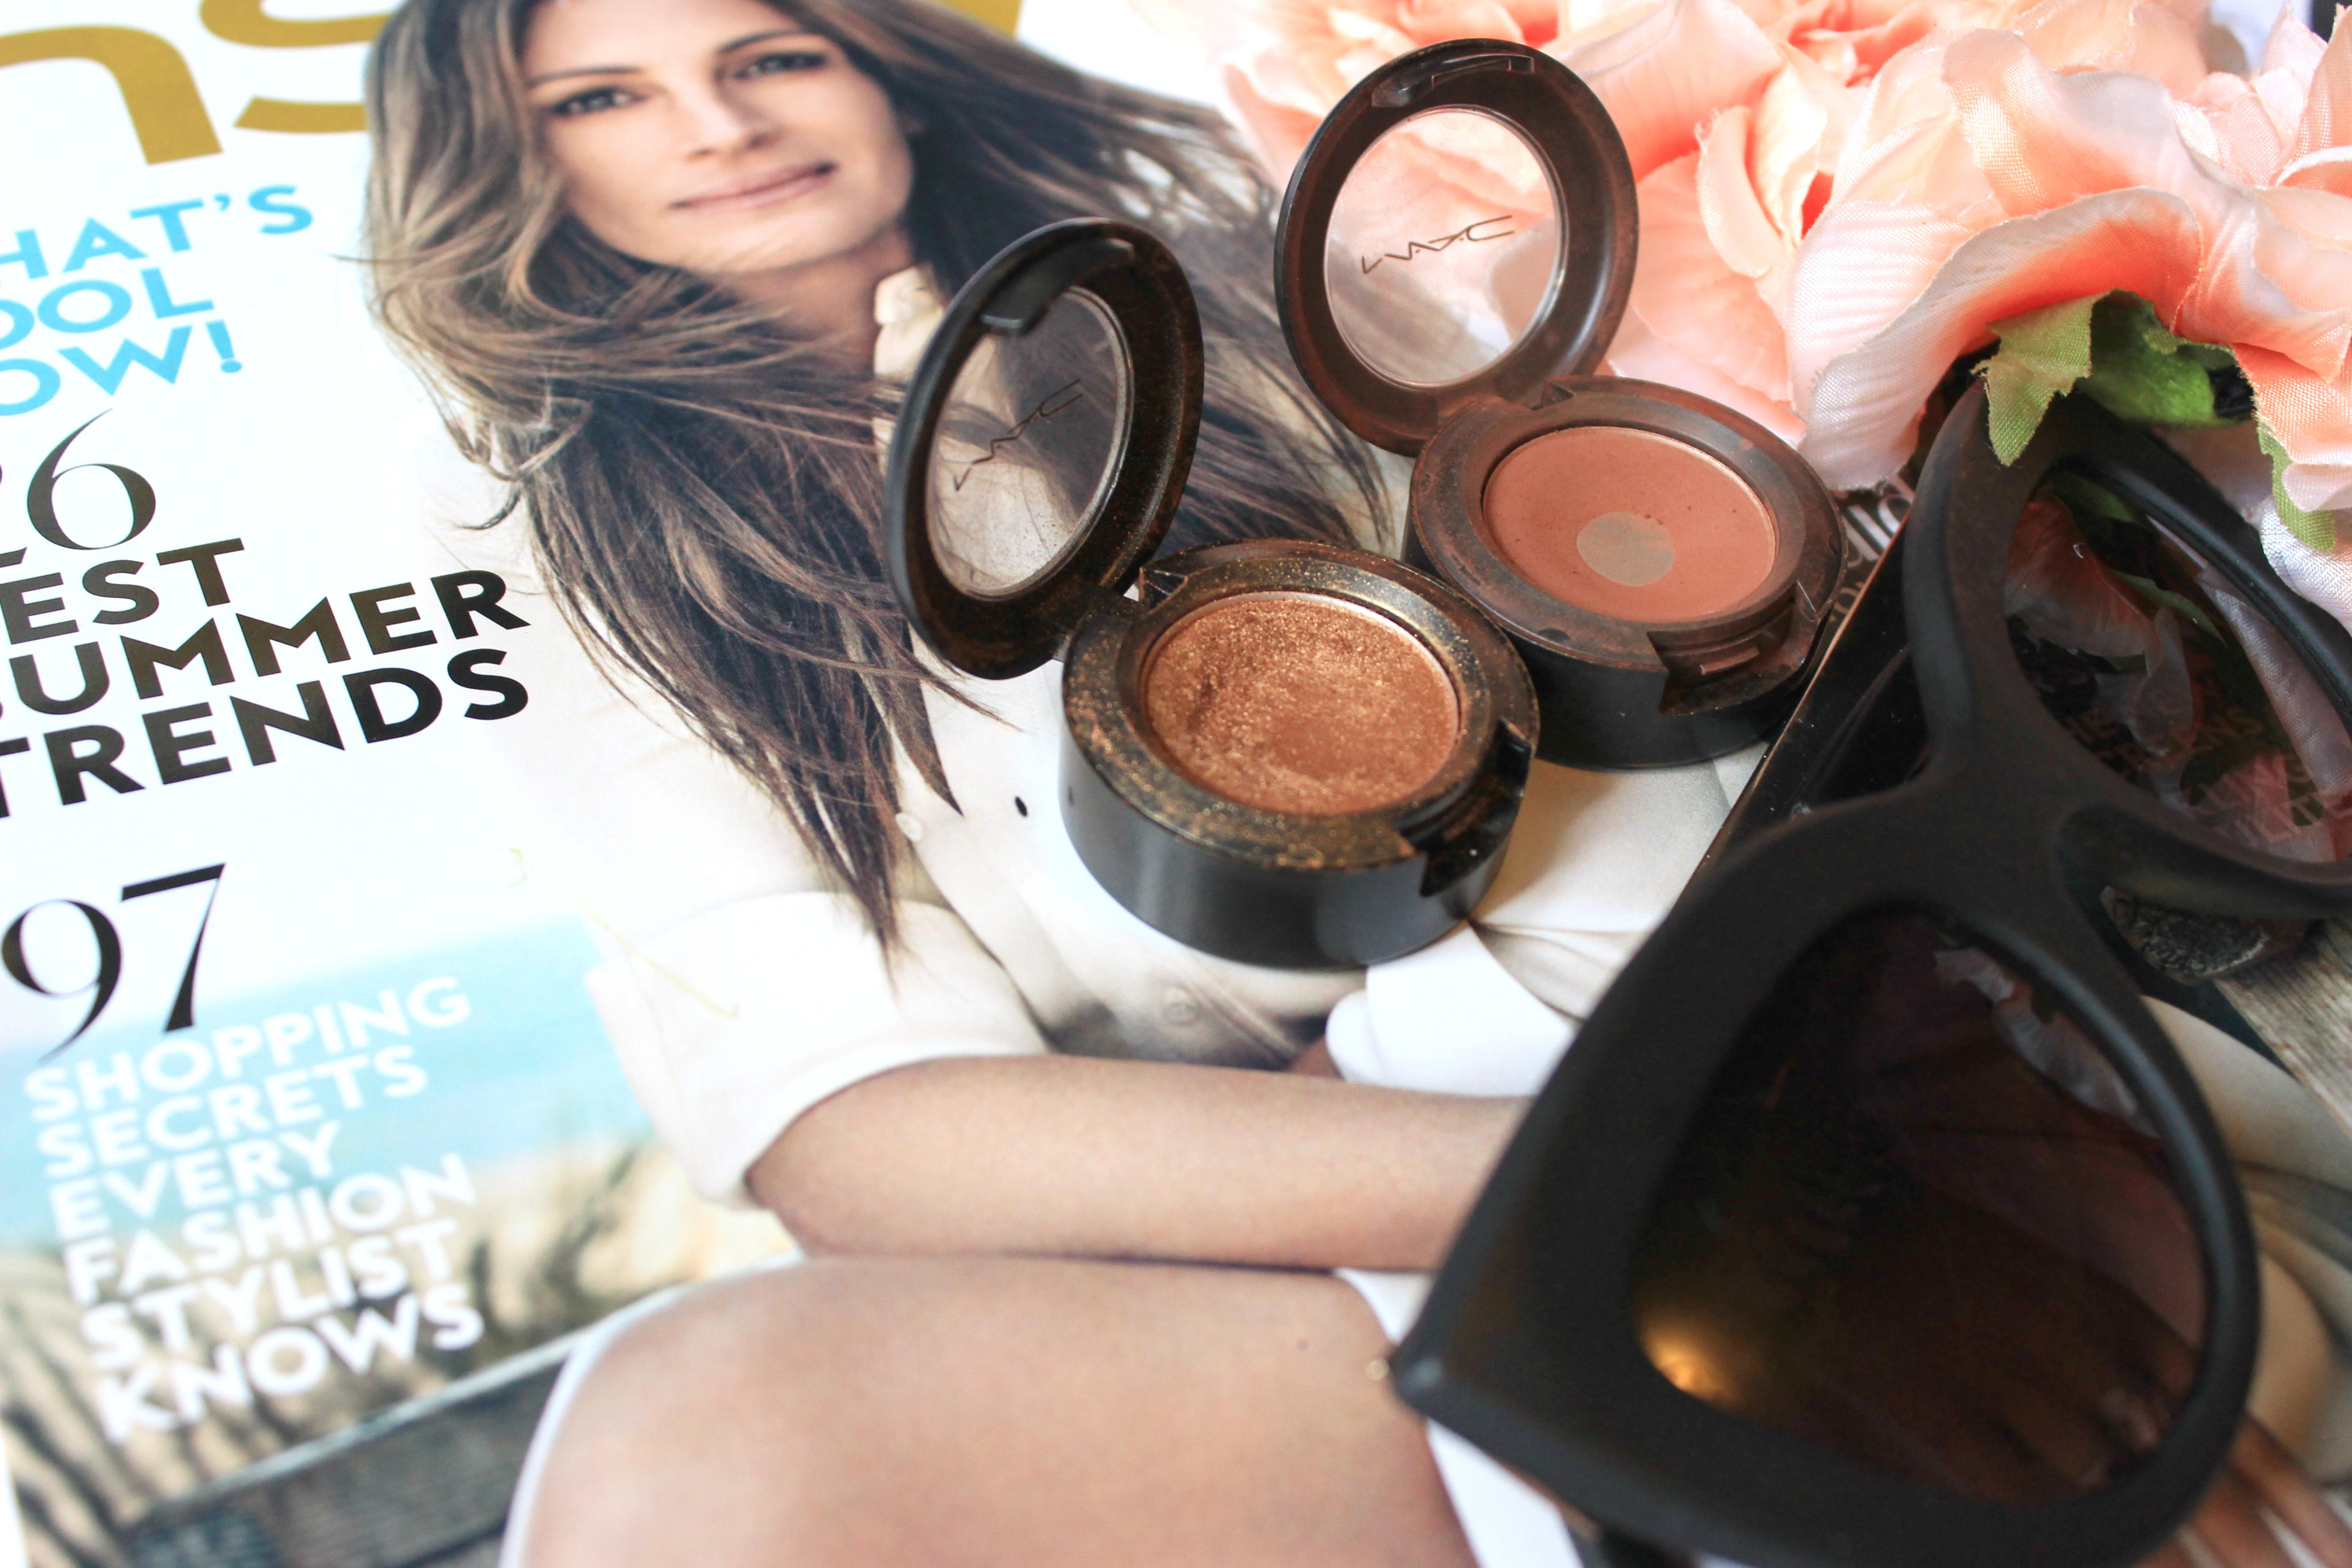 MAC-Cosmetics-Prolong-wear-concealer-Studio-fix-fluid-MAC-Amber-Lights-MAC-Brown-Script-Eye-Shadow-MAC-Pigment-Tan-MAC-Faux-lipstick-Makeup-Mondays-Oohlalablog-16